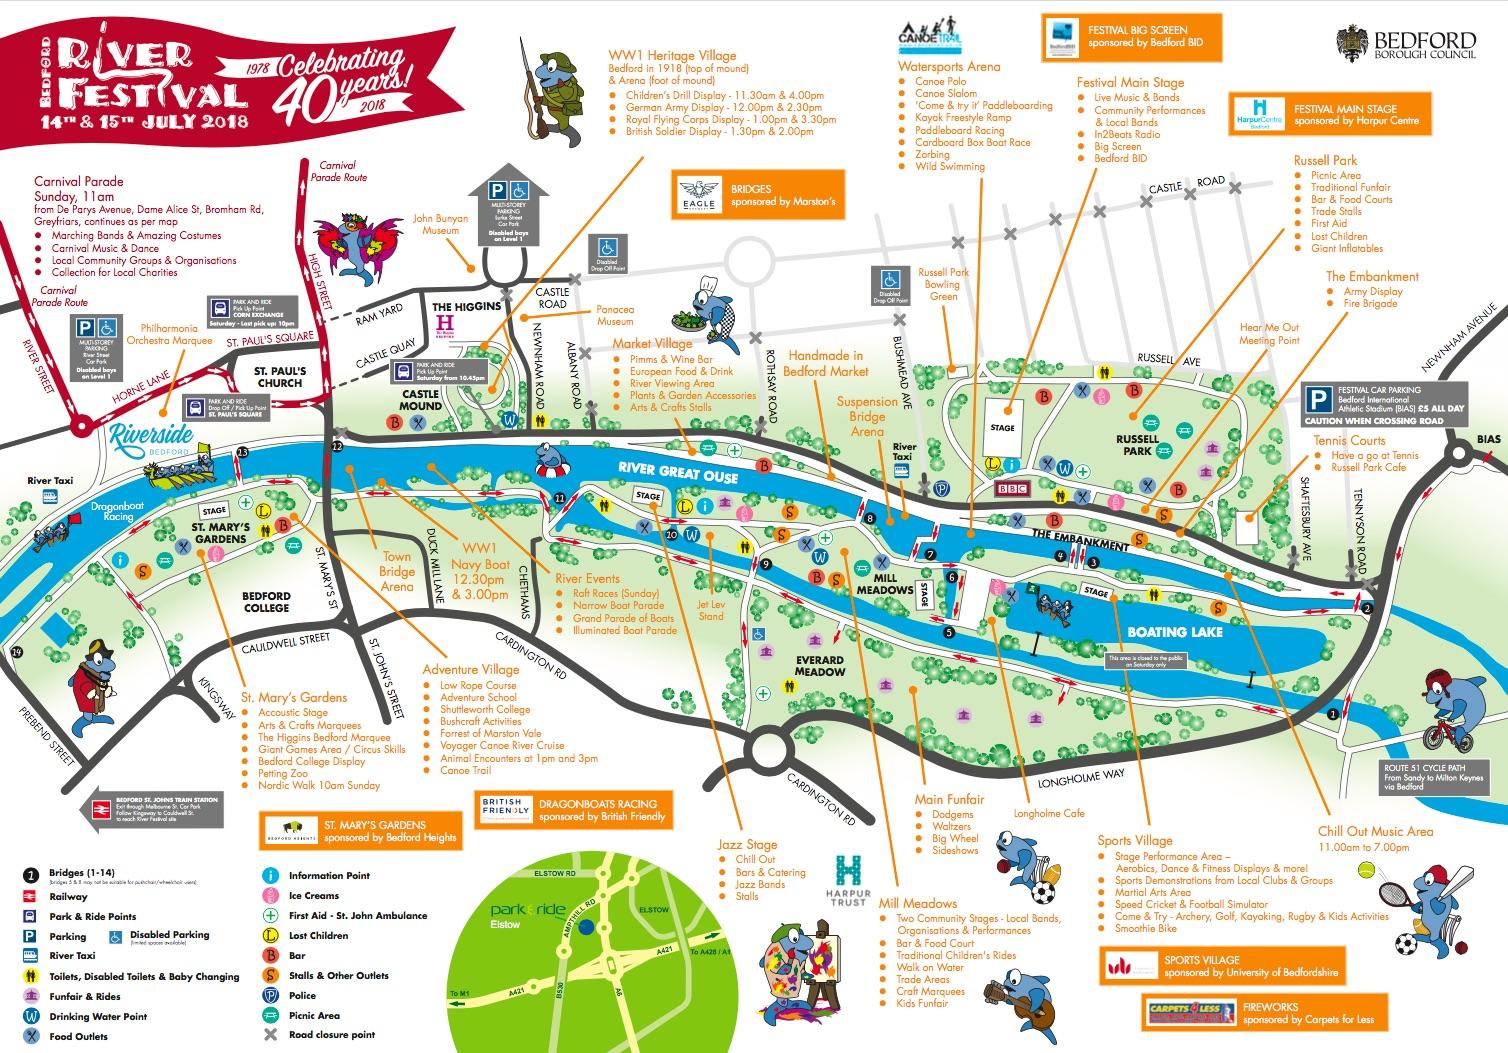 Bedford River Festival Map 2018